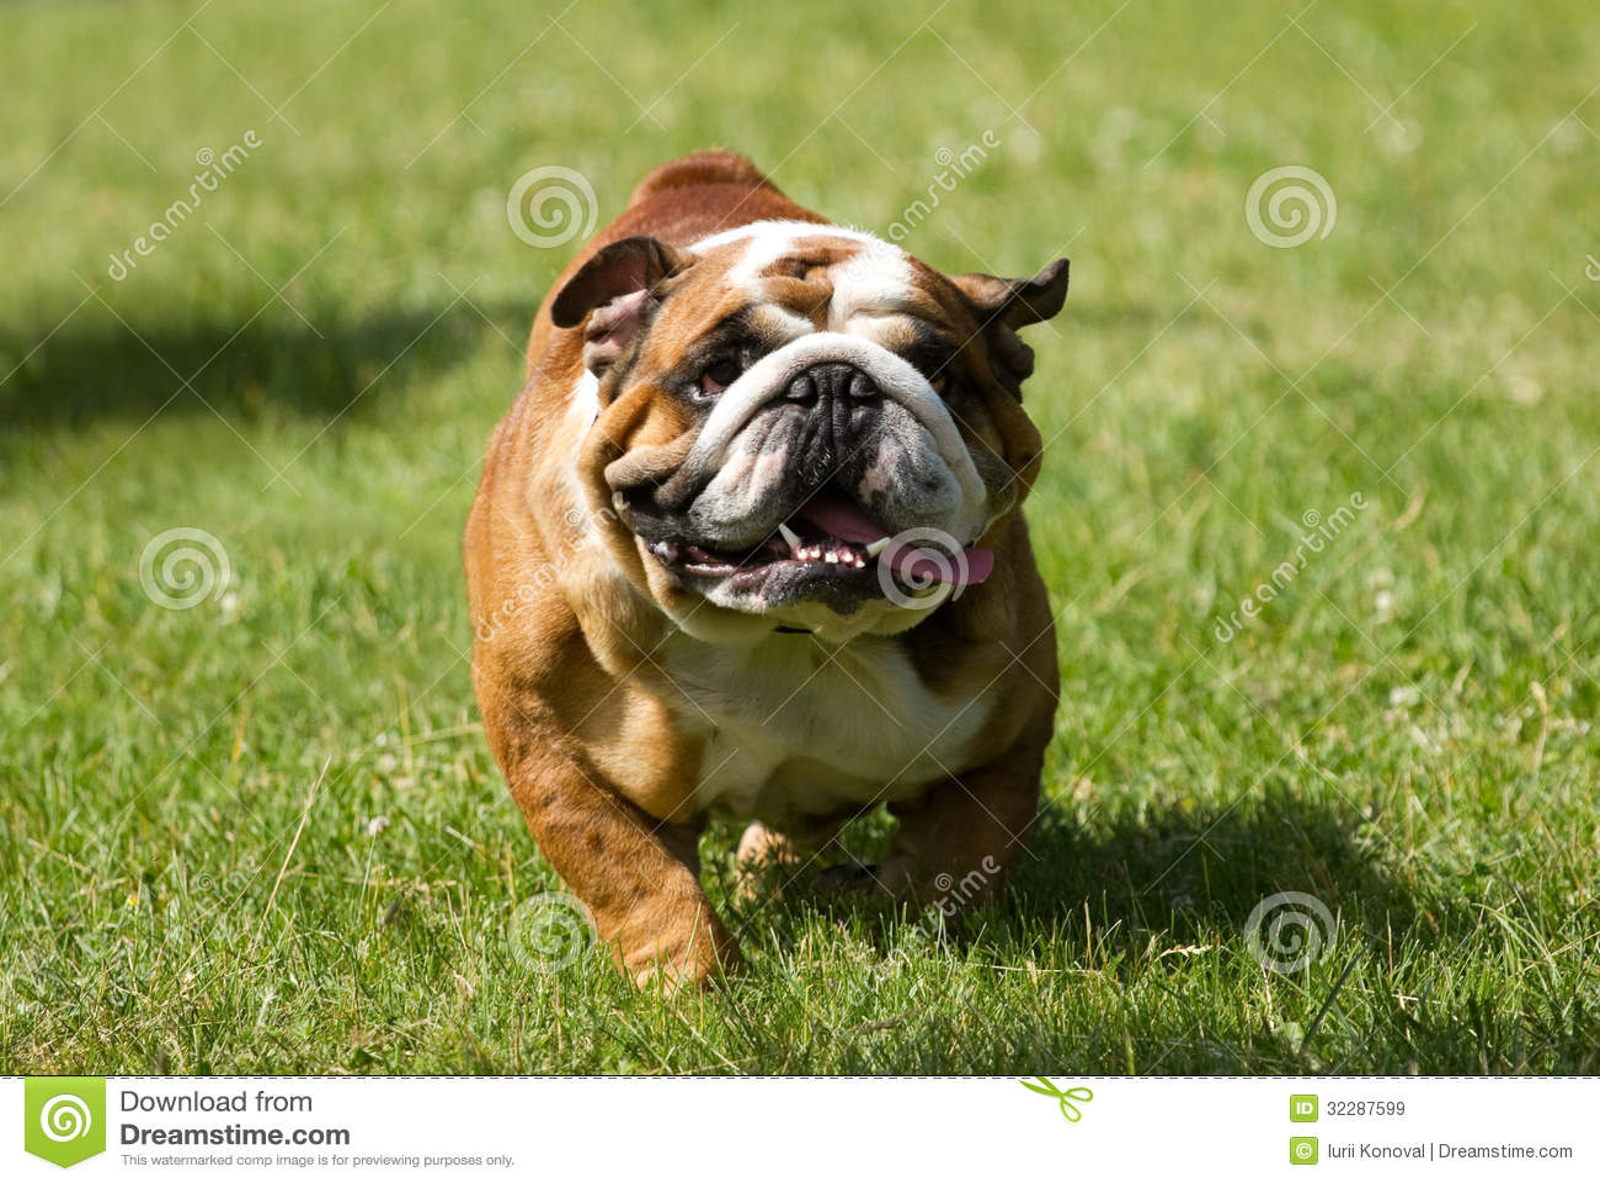 English Bulldog Running Royalty Free Stock Images - Image ...